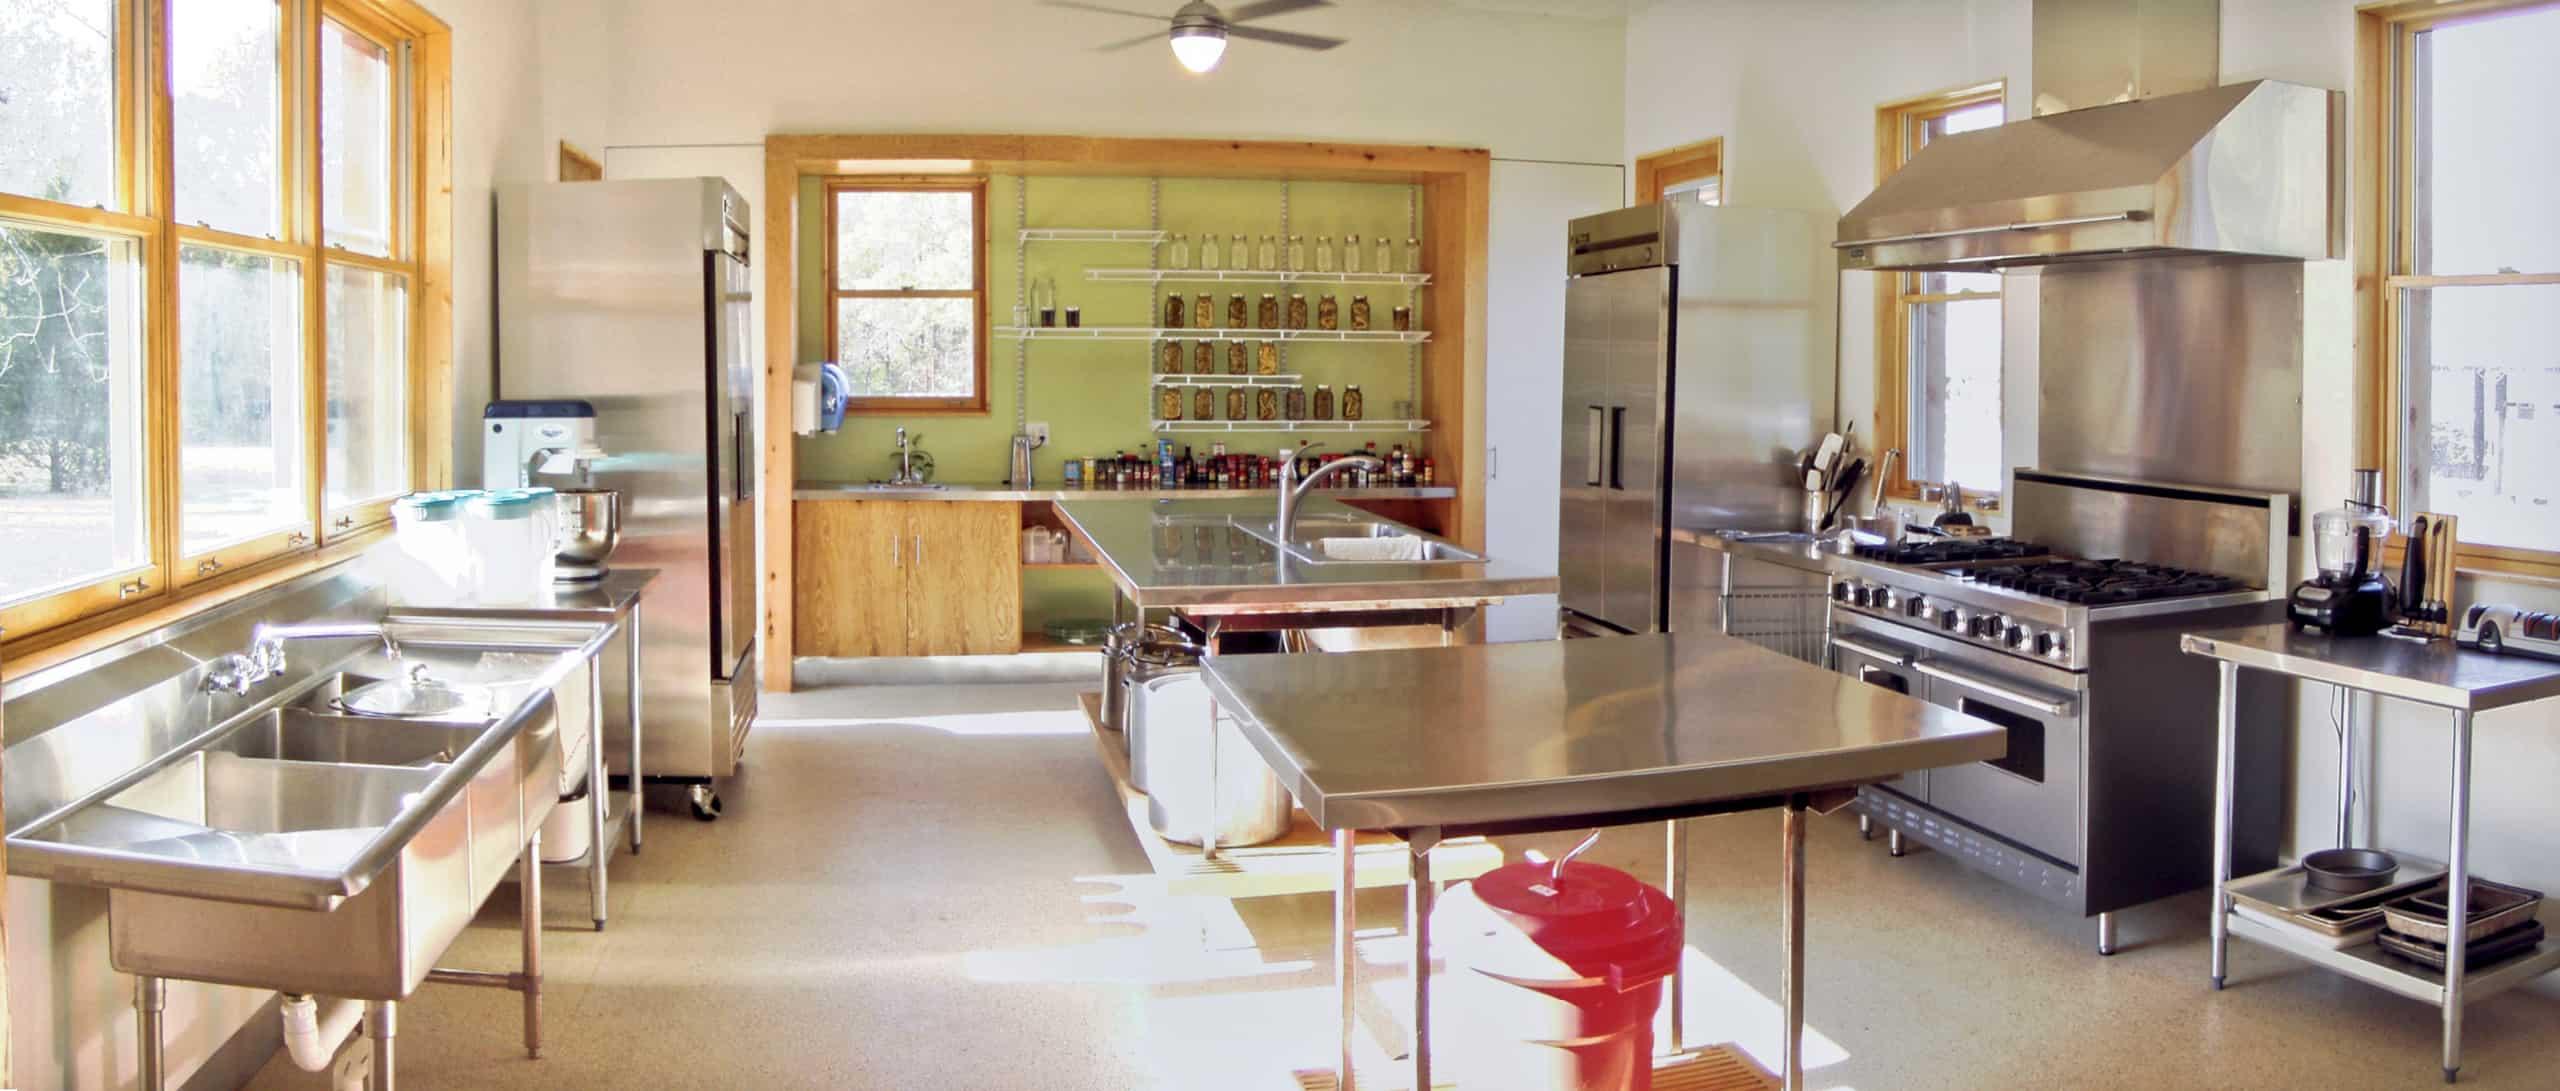 wide angle shot of kitchen